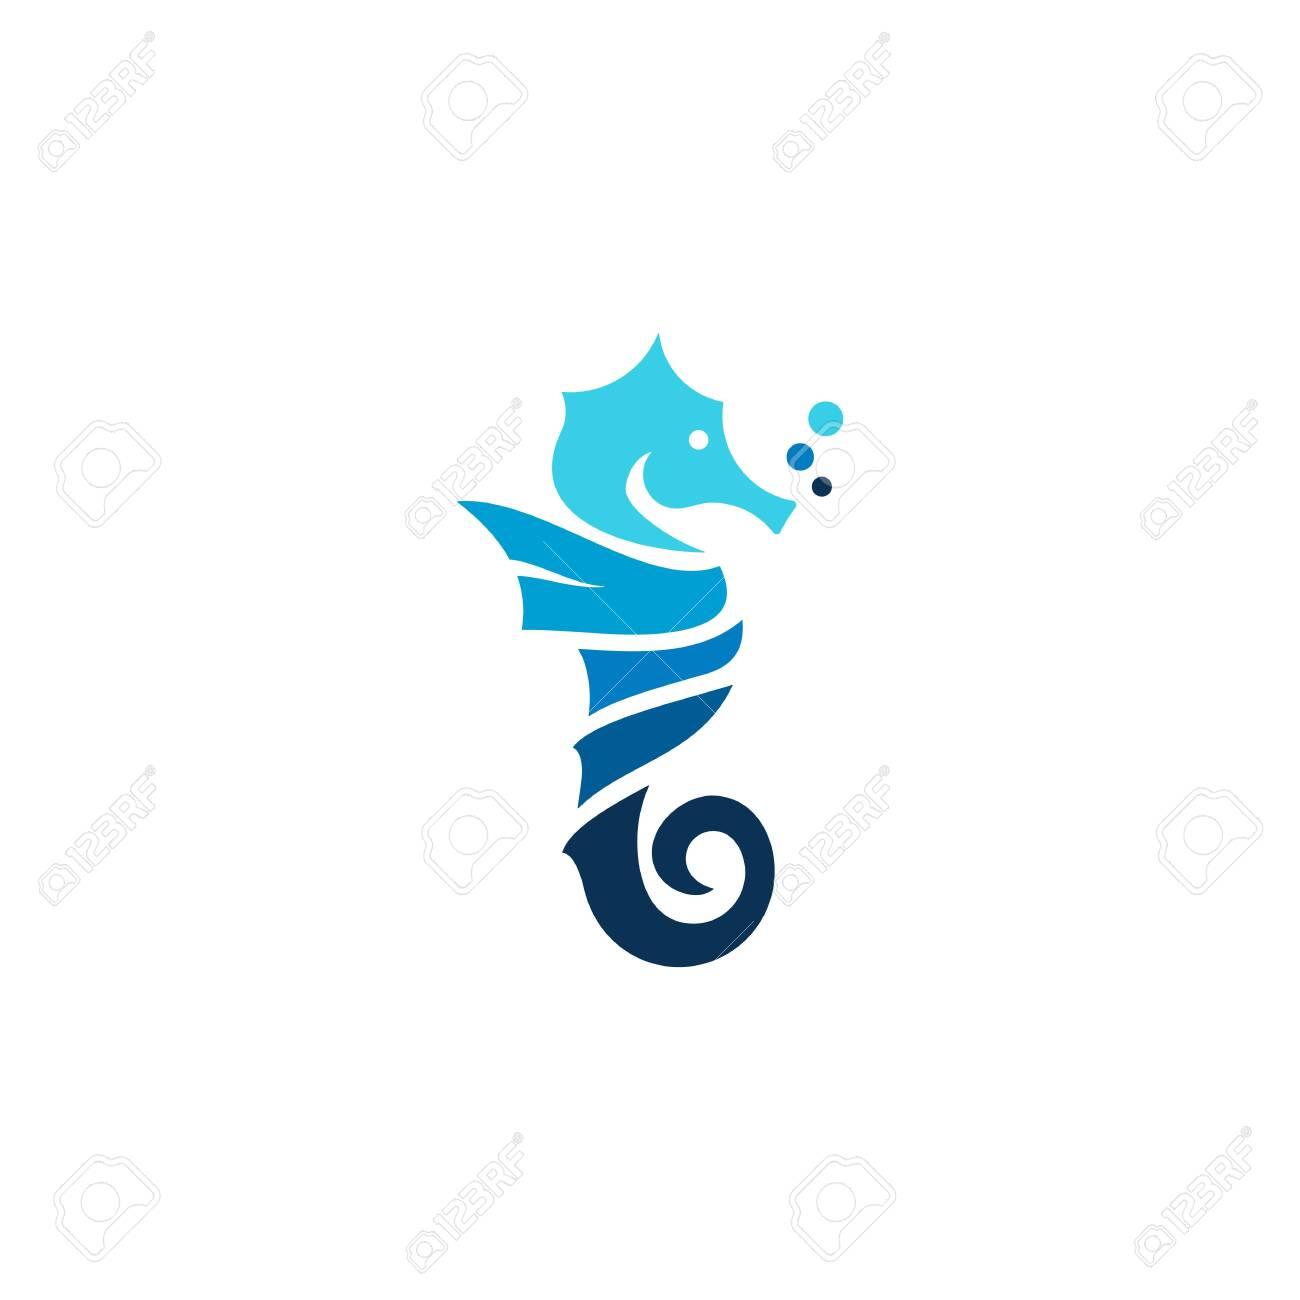 Seahorse Logo Blue Flat Monogram Royalty Free Cliparts Vectors And Stock Illustration Image 127352751